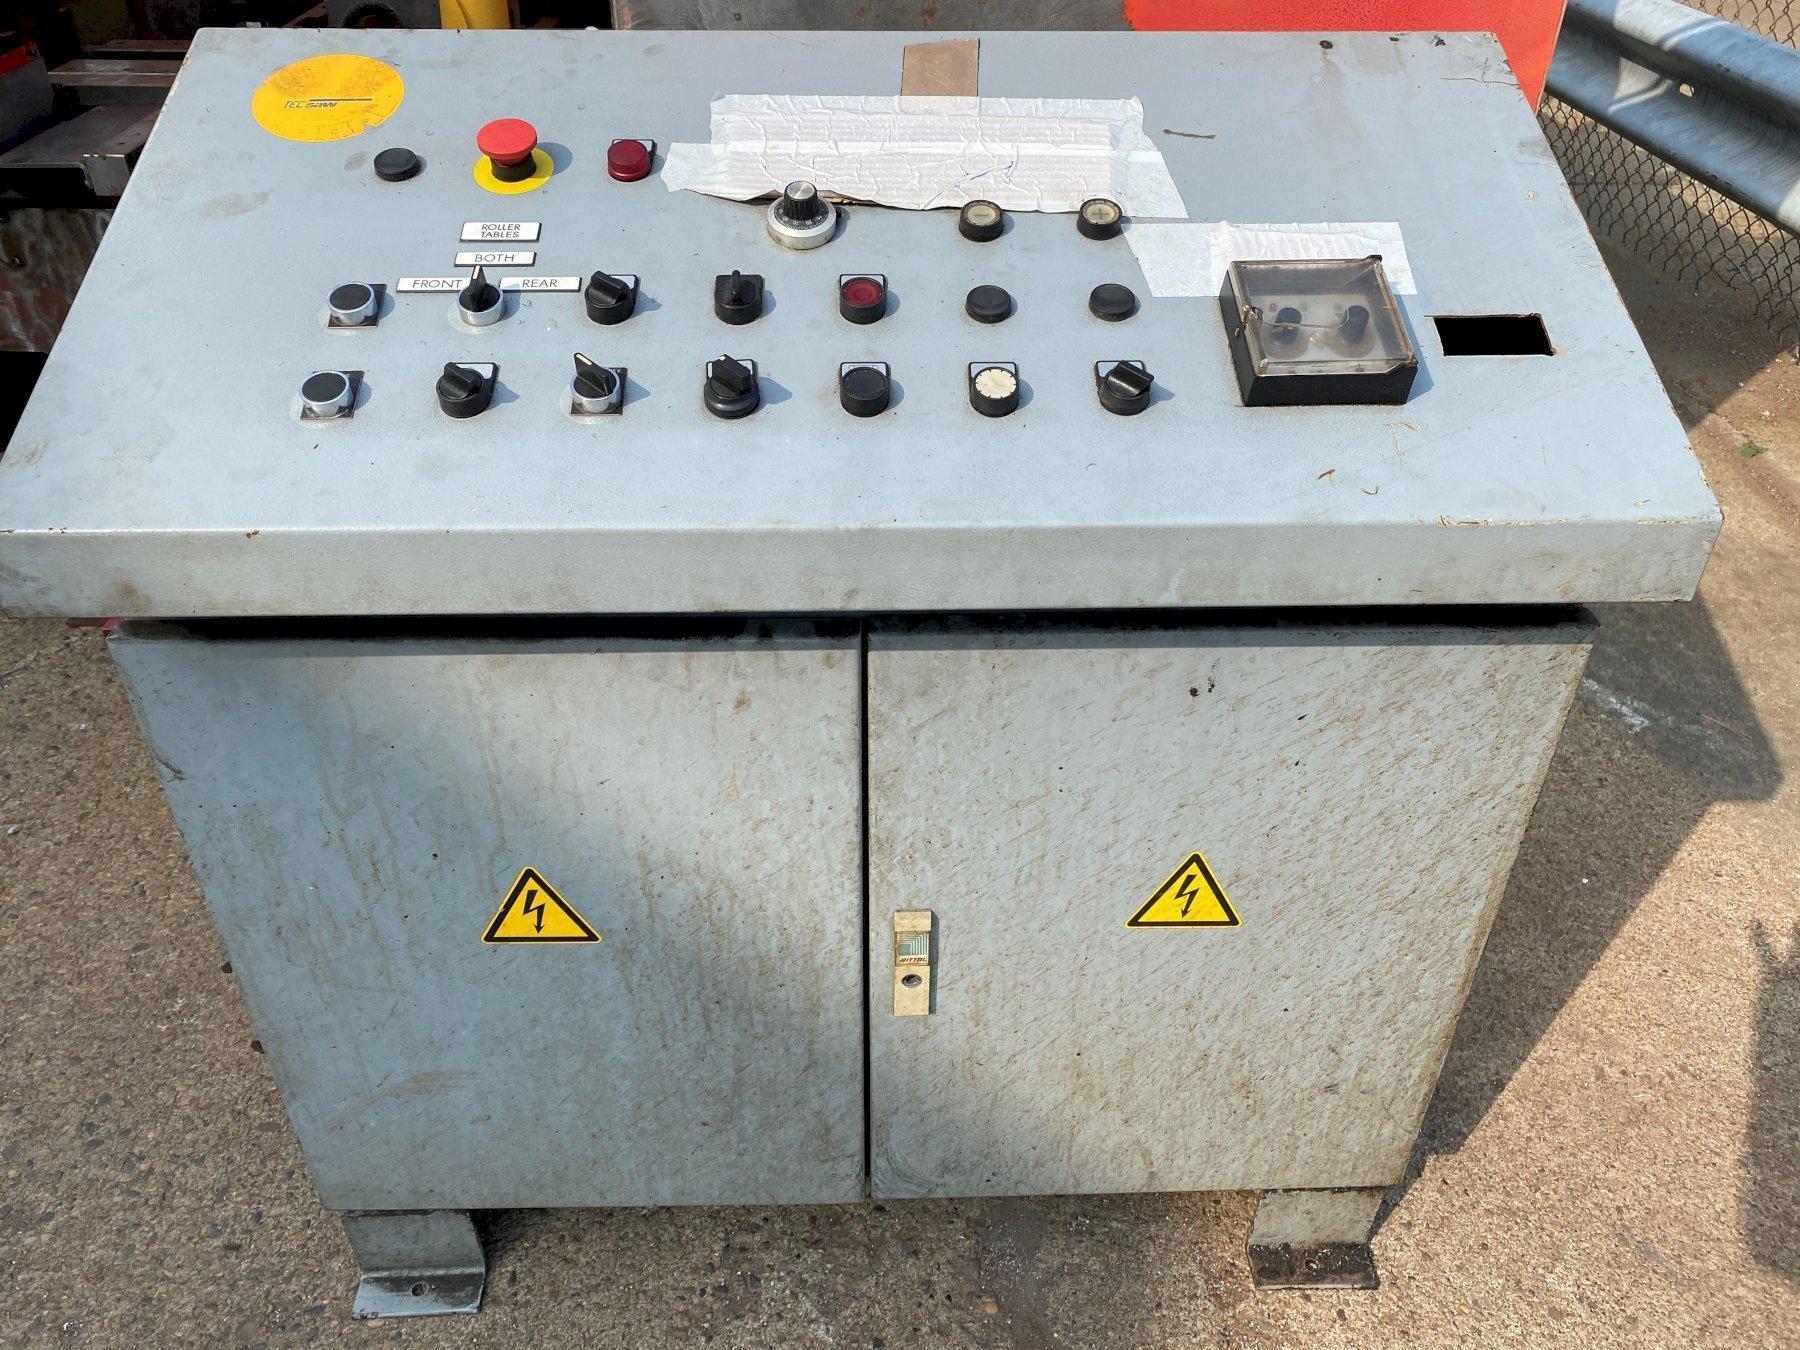 "KASTO 65"" X 41"" SEMI-AUTOMATIC DUAL COLUMN HORIZONTAL BANDSAW MODEL PBA 1060/1660 U"